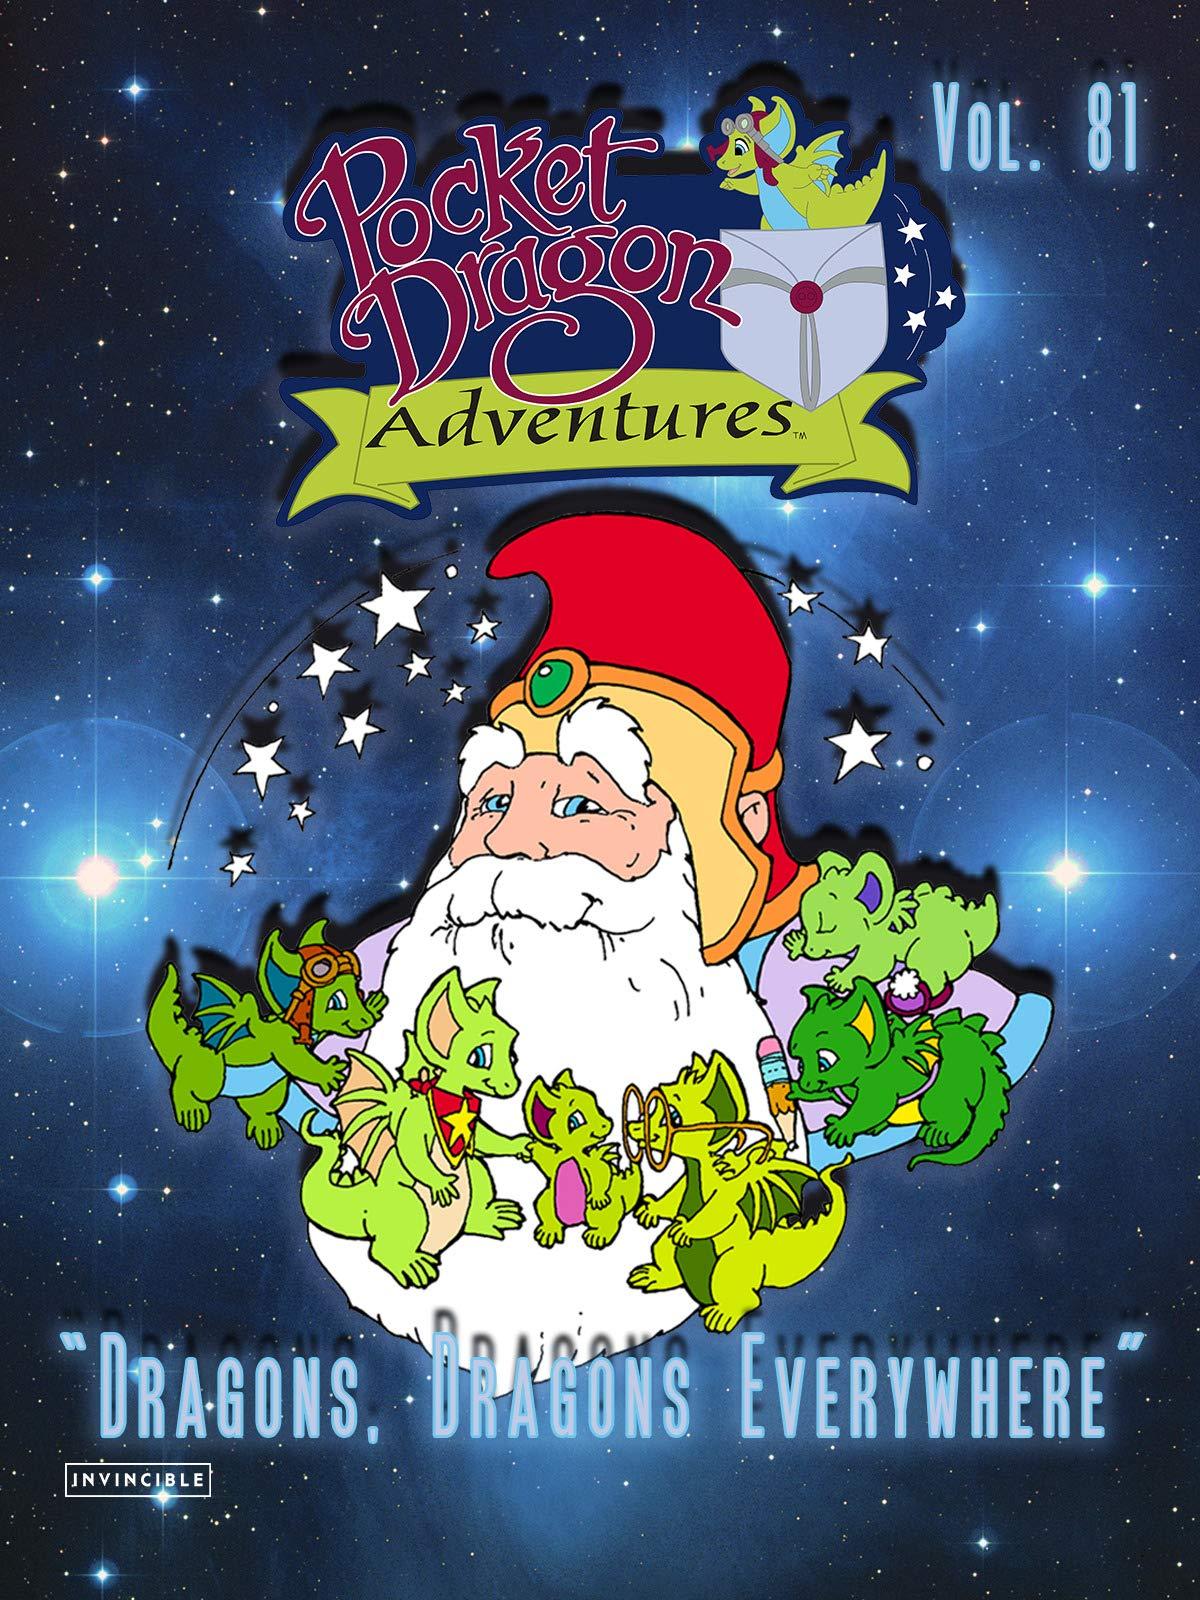 Pocket Dragon Adventures Vol. 81Dragons, Dragons Everywhere